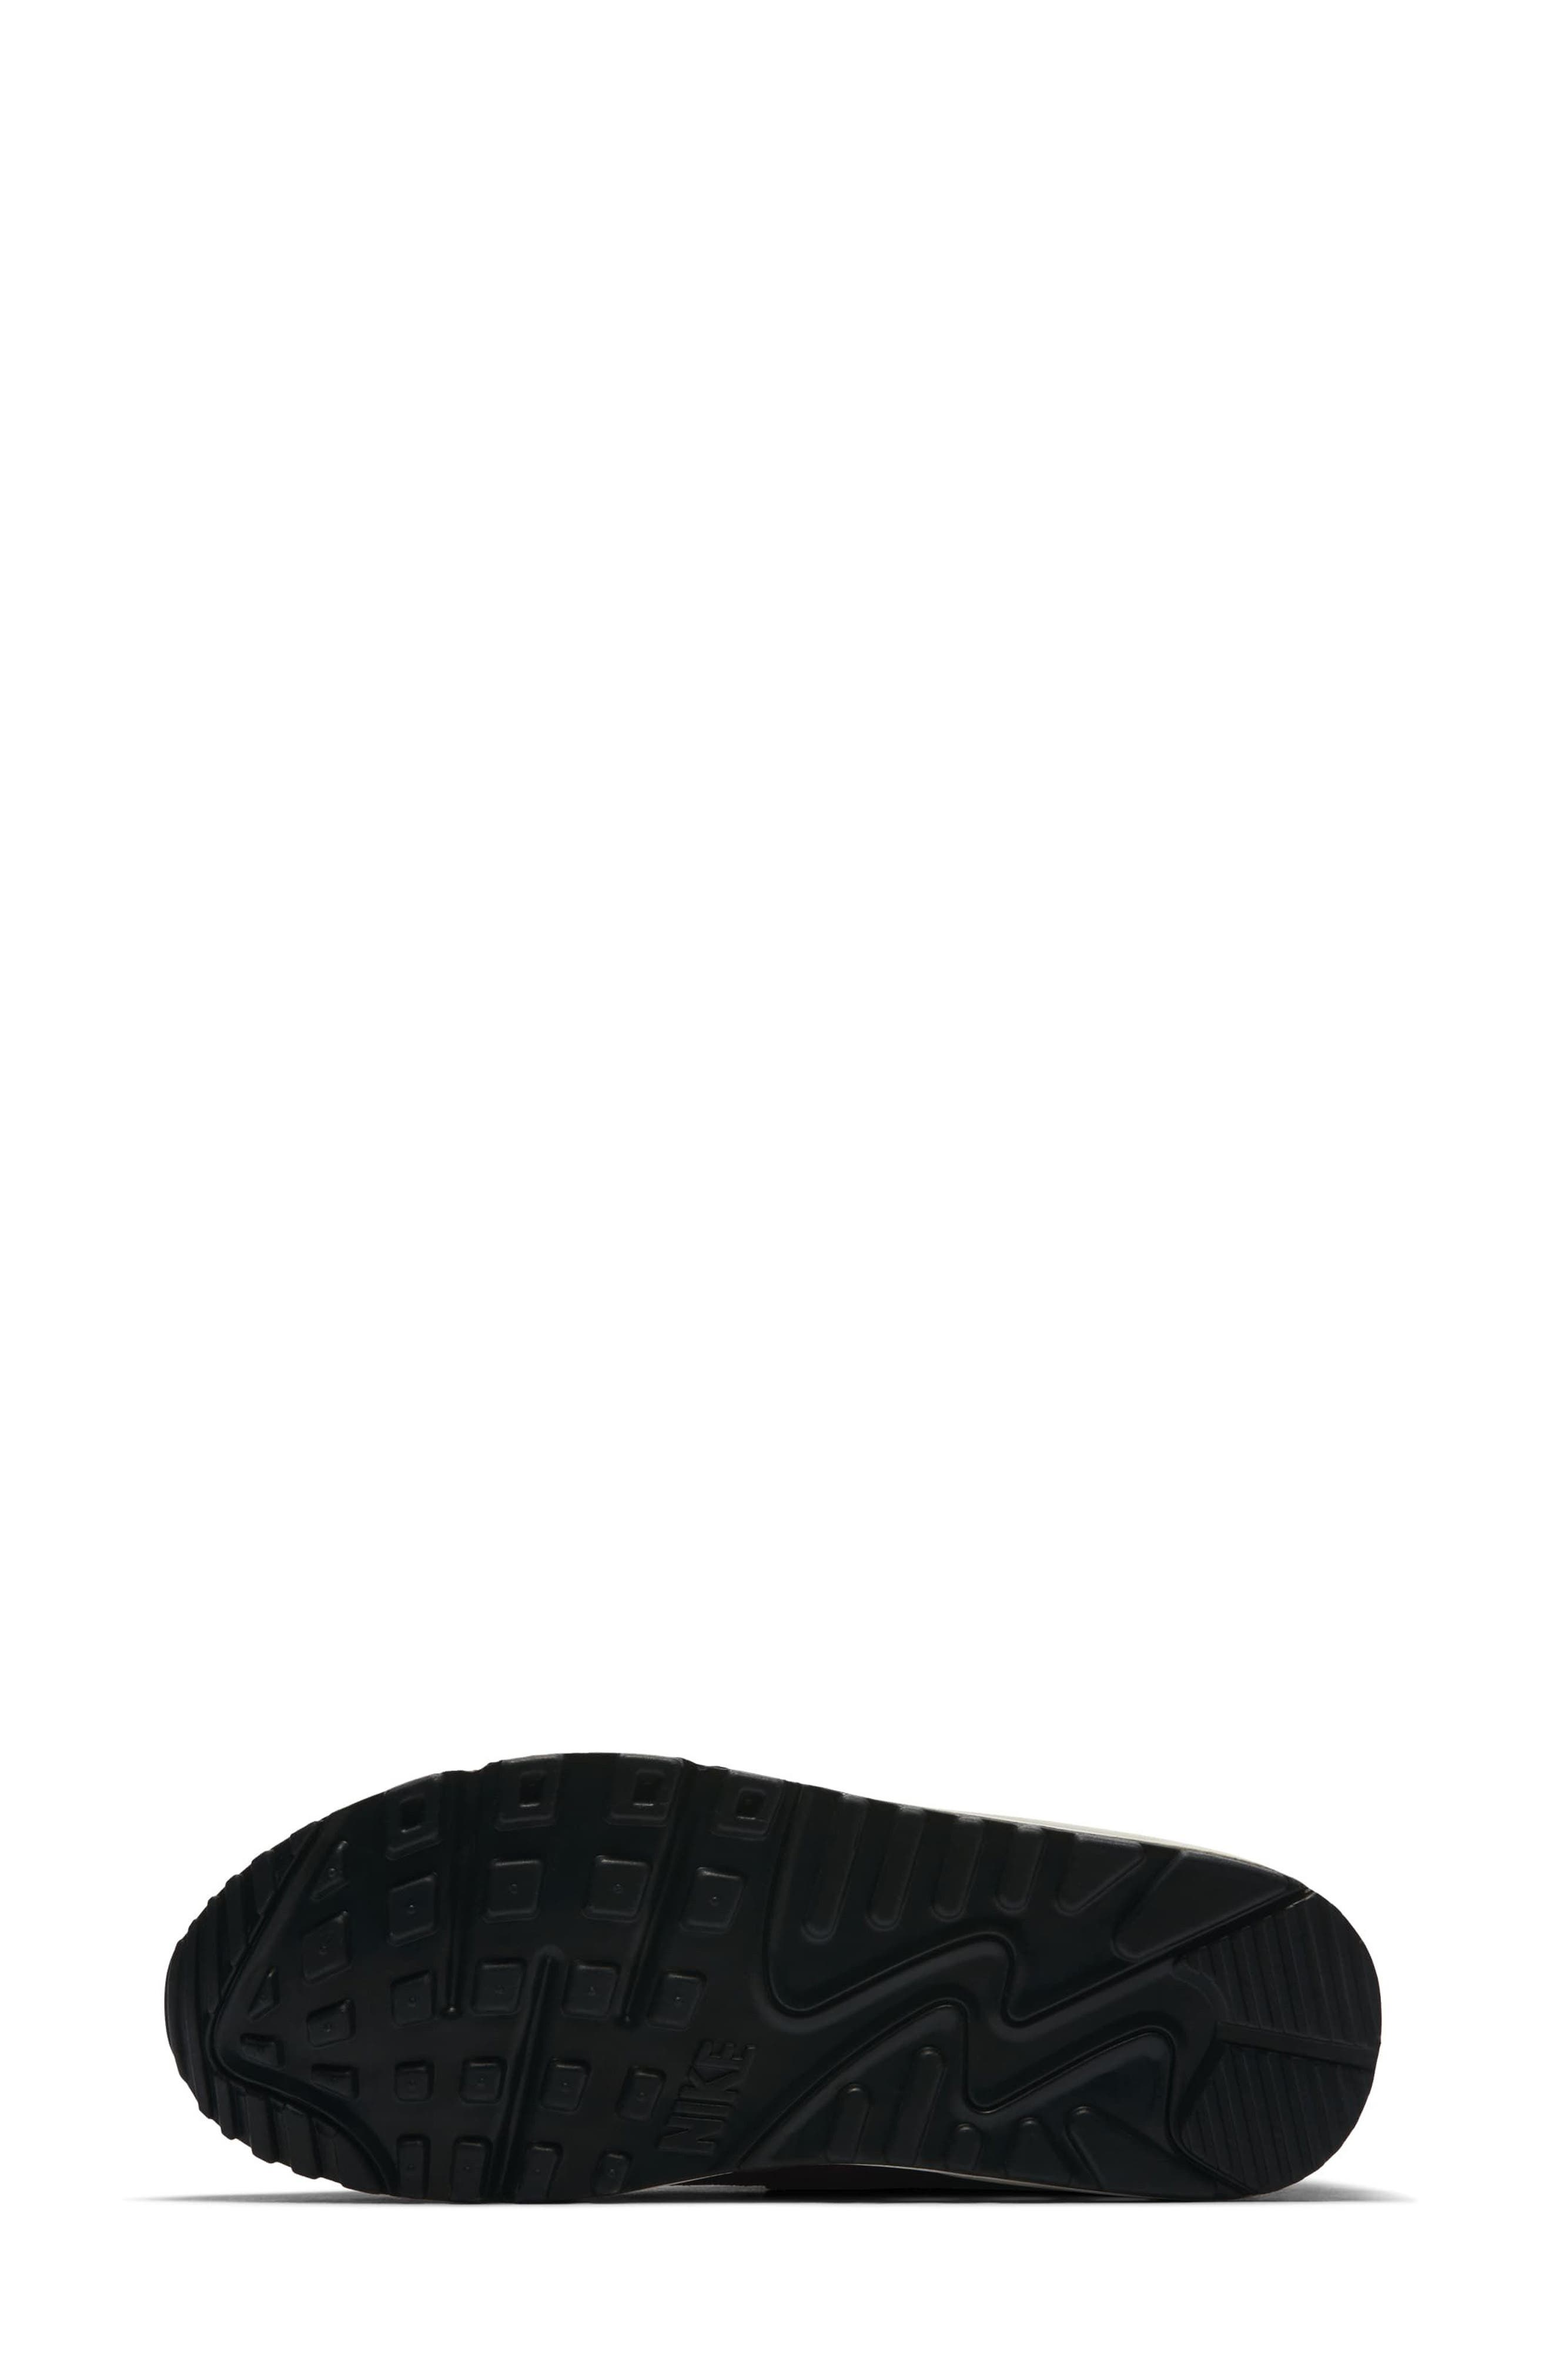 Air Max 90 SE Sneaker,                             Alternate thumbnail 45, color,